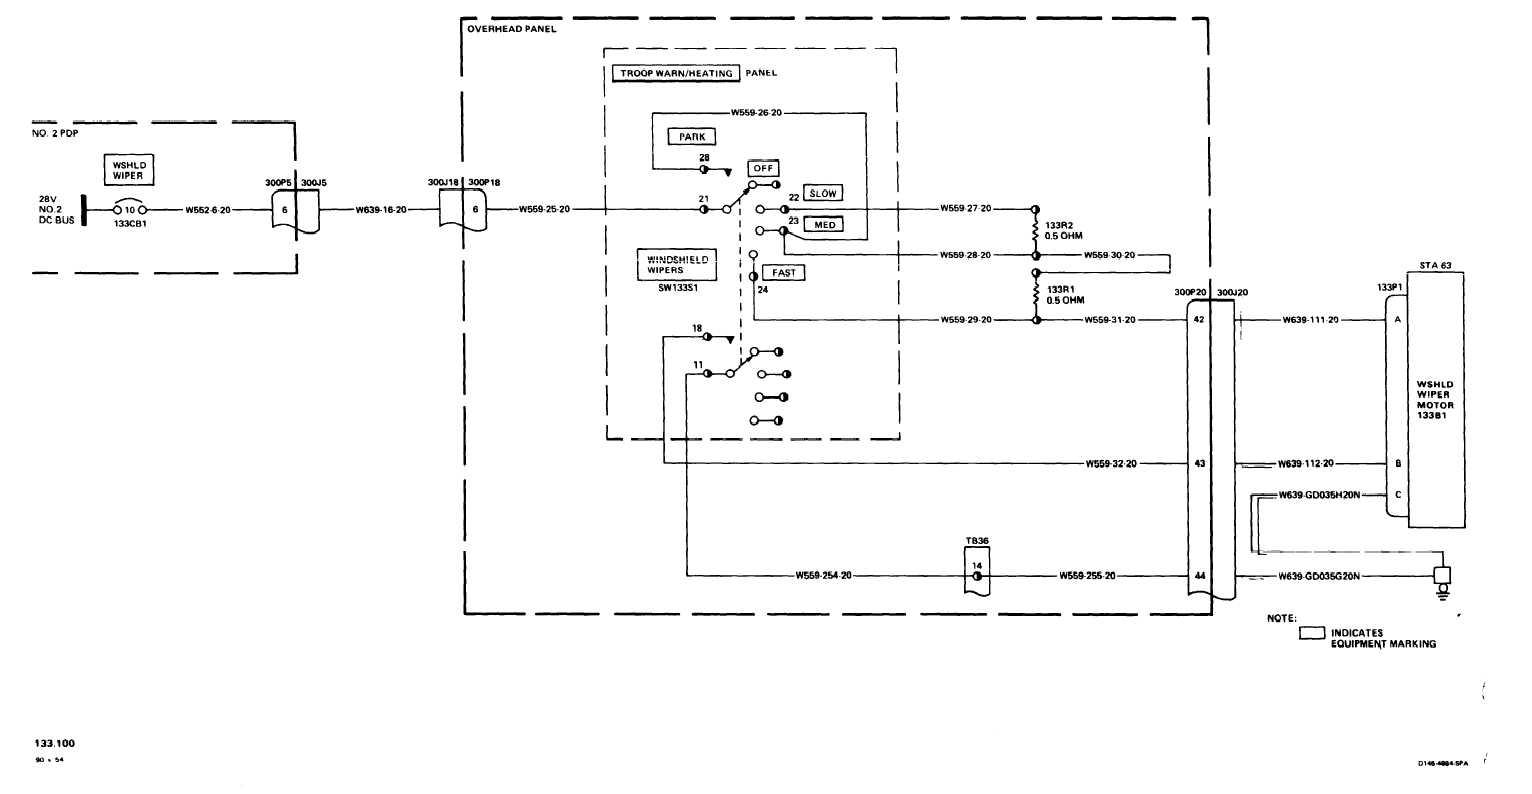 Windshield Wipers Wiring Diagram - Windshield Wiper Motor Wiring Diagram